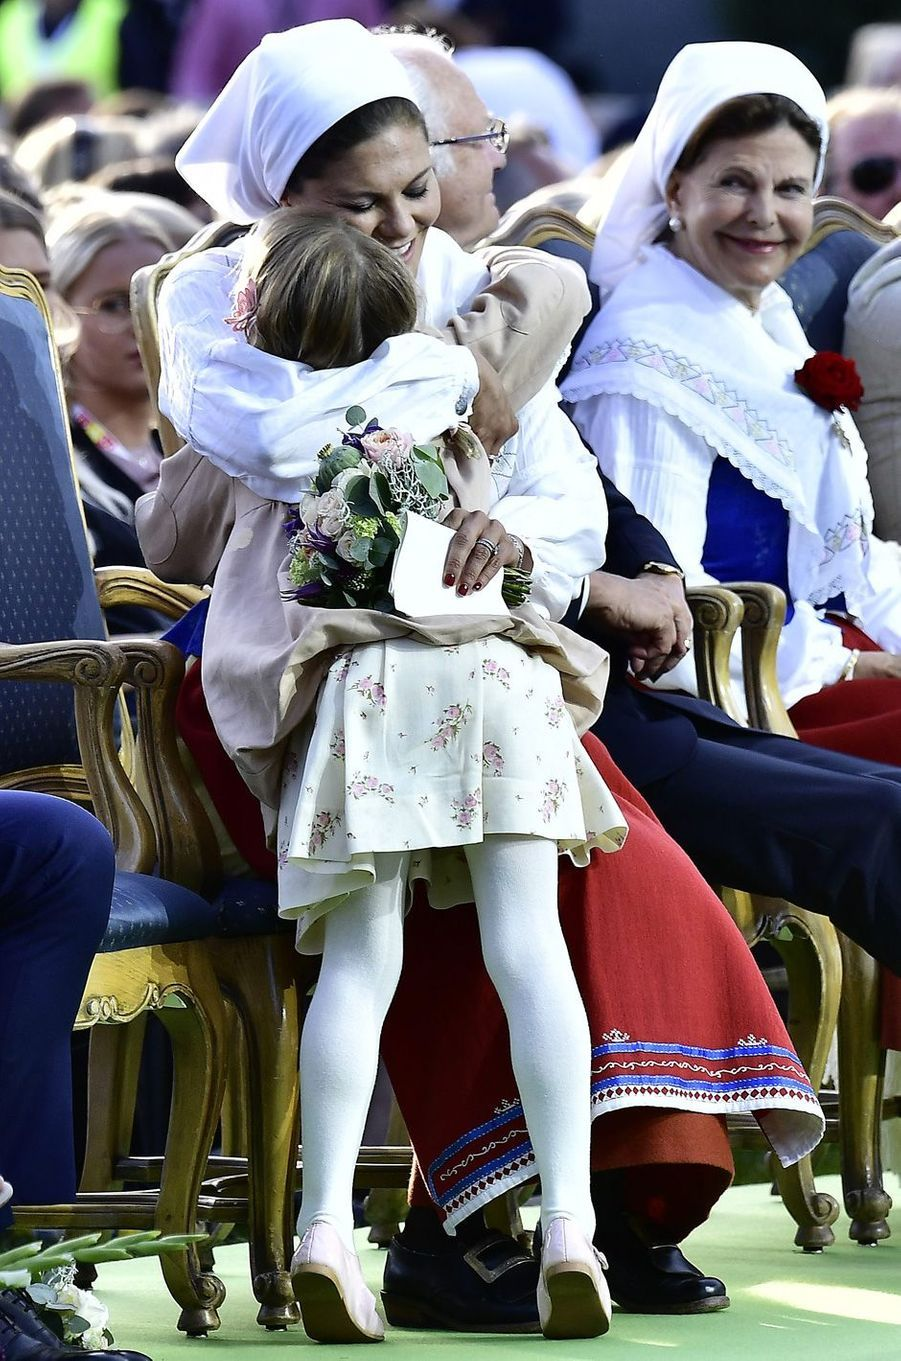 La princesse Victoria et la princesse Estelleaux 40 ans de la princesse Victoria, le 14 juillet 2017.